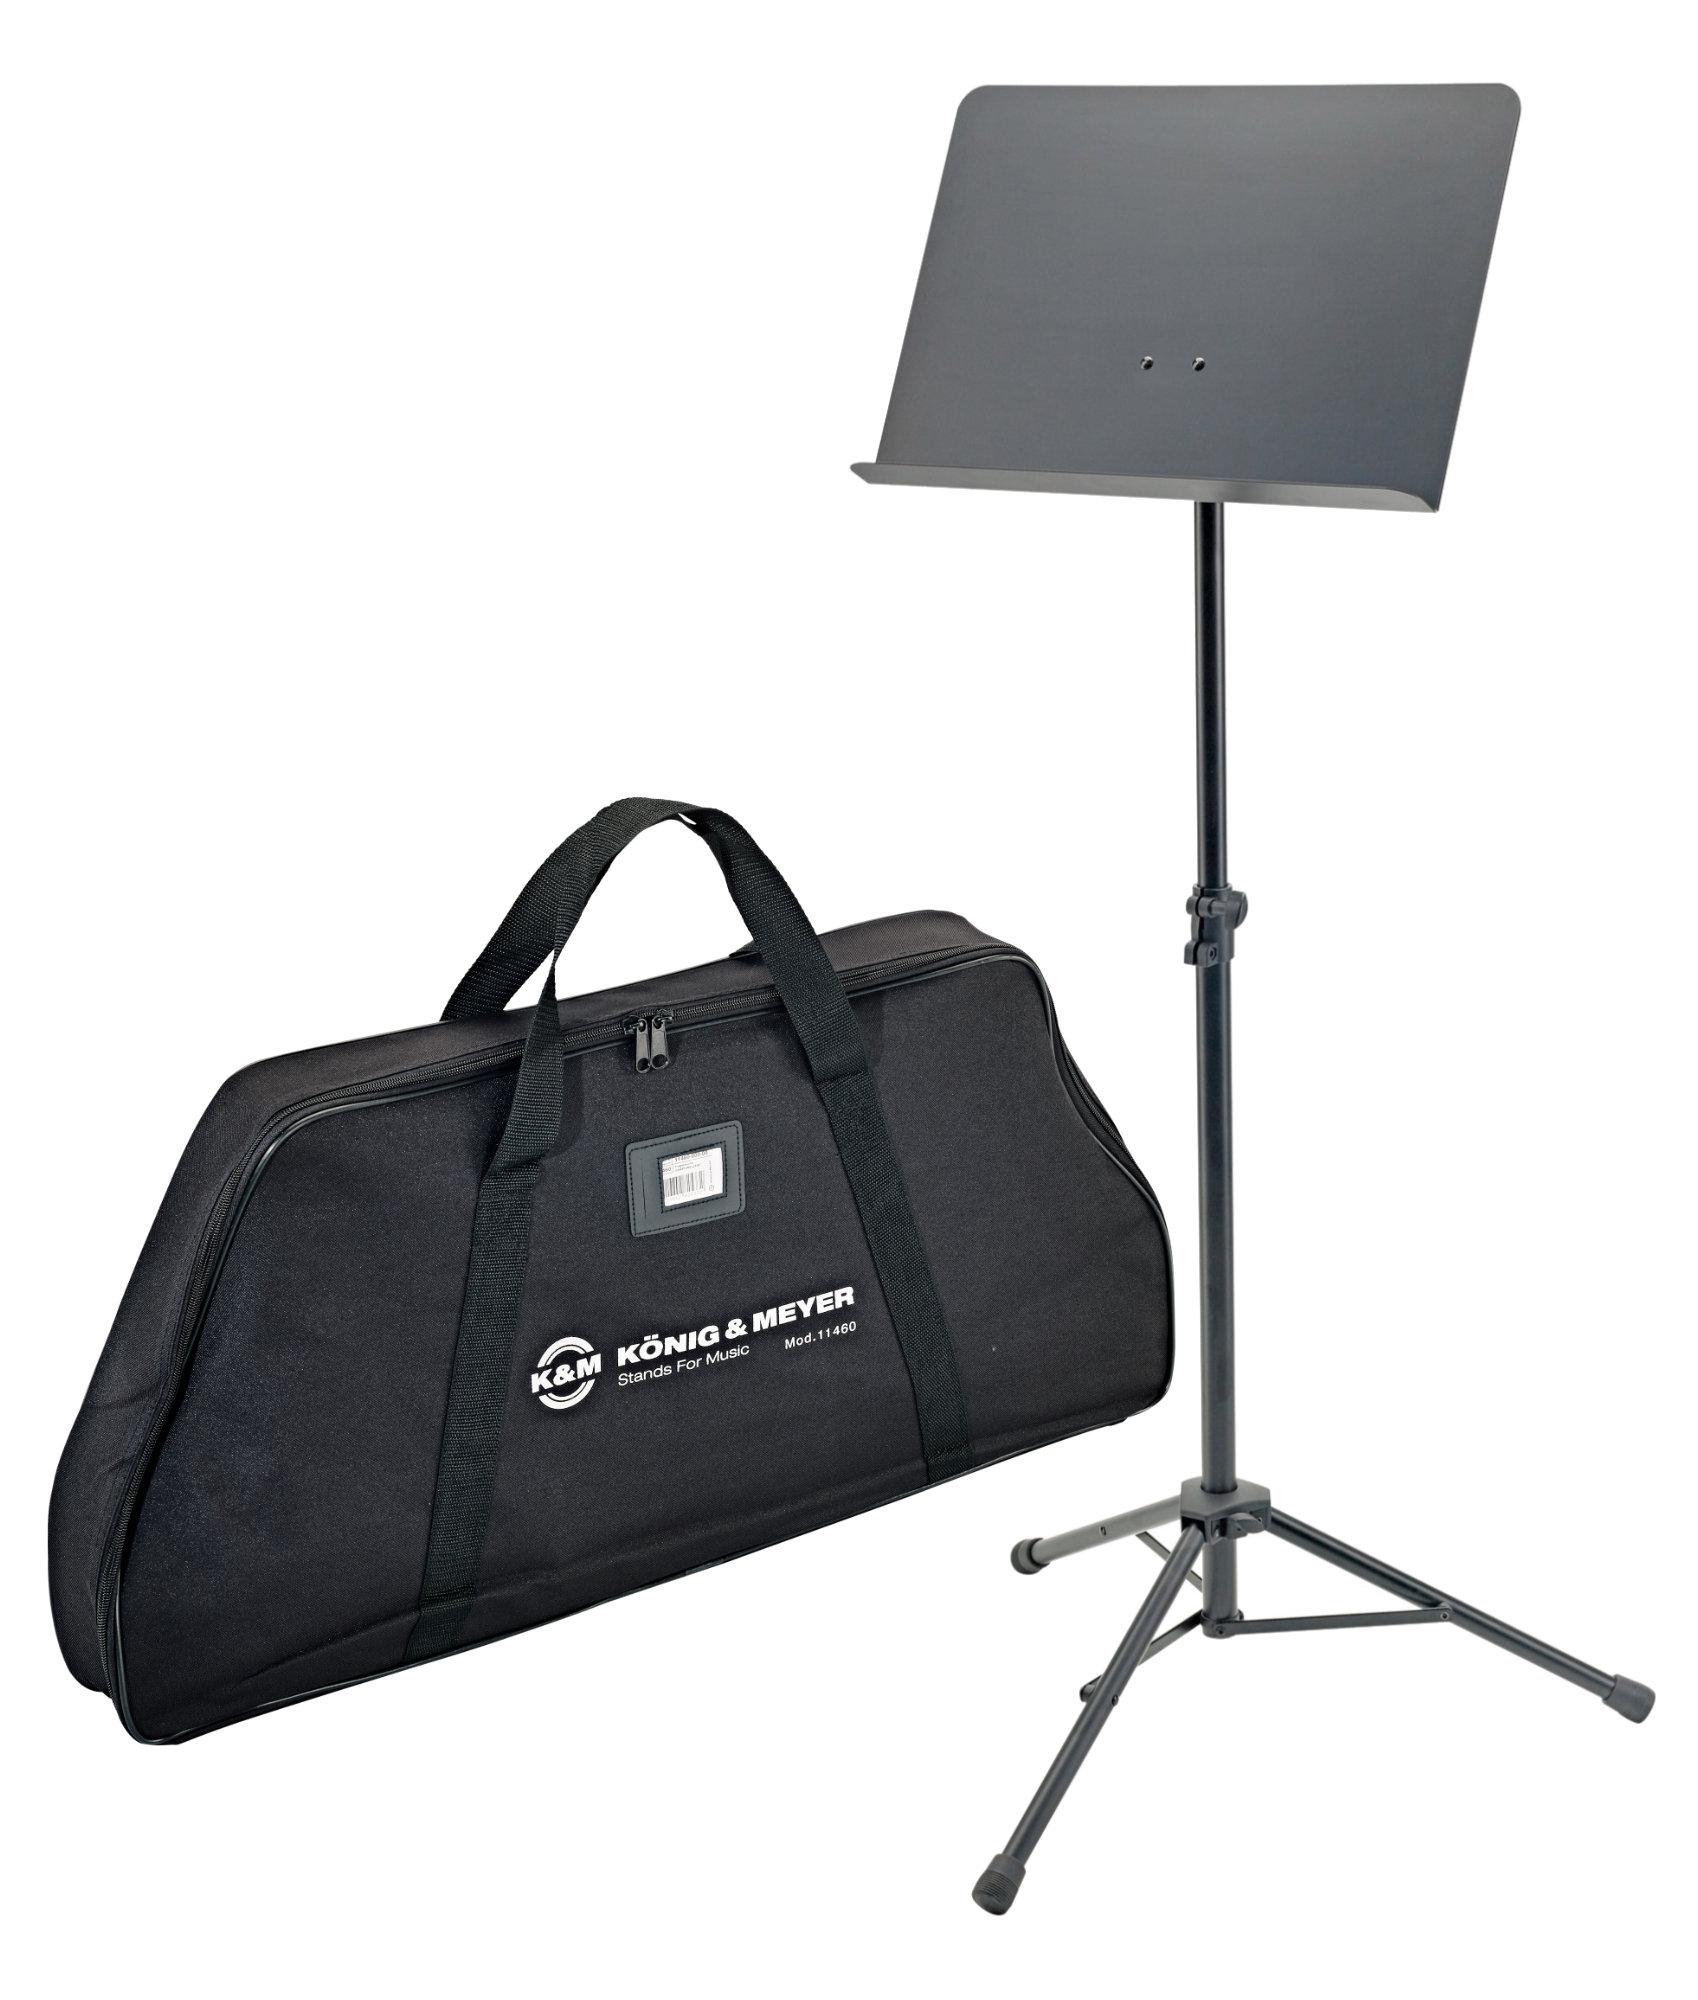 Musikerzubehoer - K M 11960 Orchesterpult Set inkl. Tasche - Onlineshop Musikhaus Kirstein